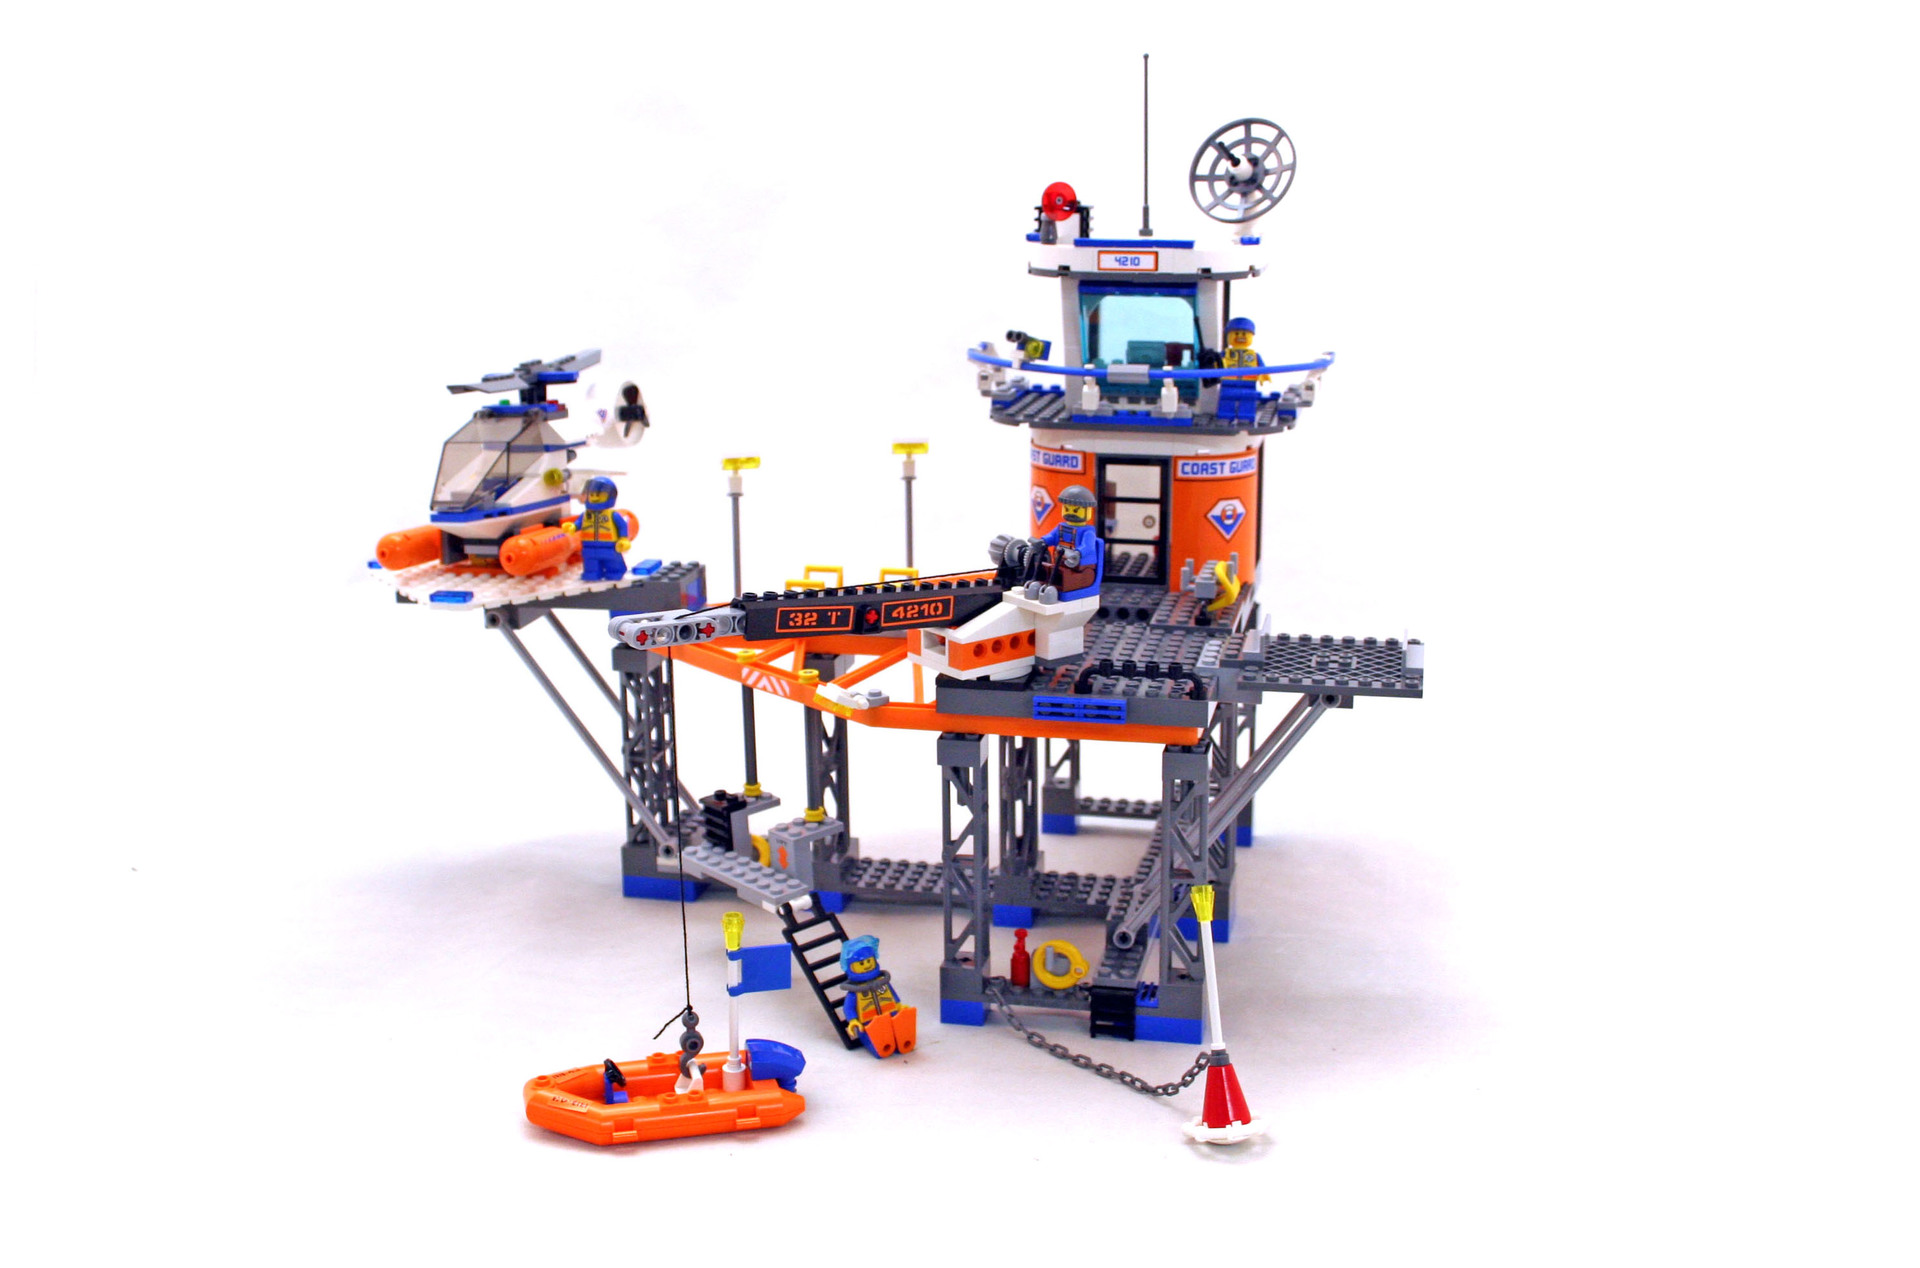 Coast Guard Platform - LEGO set #4210-1 (Building Sets > City)